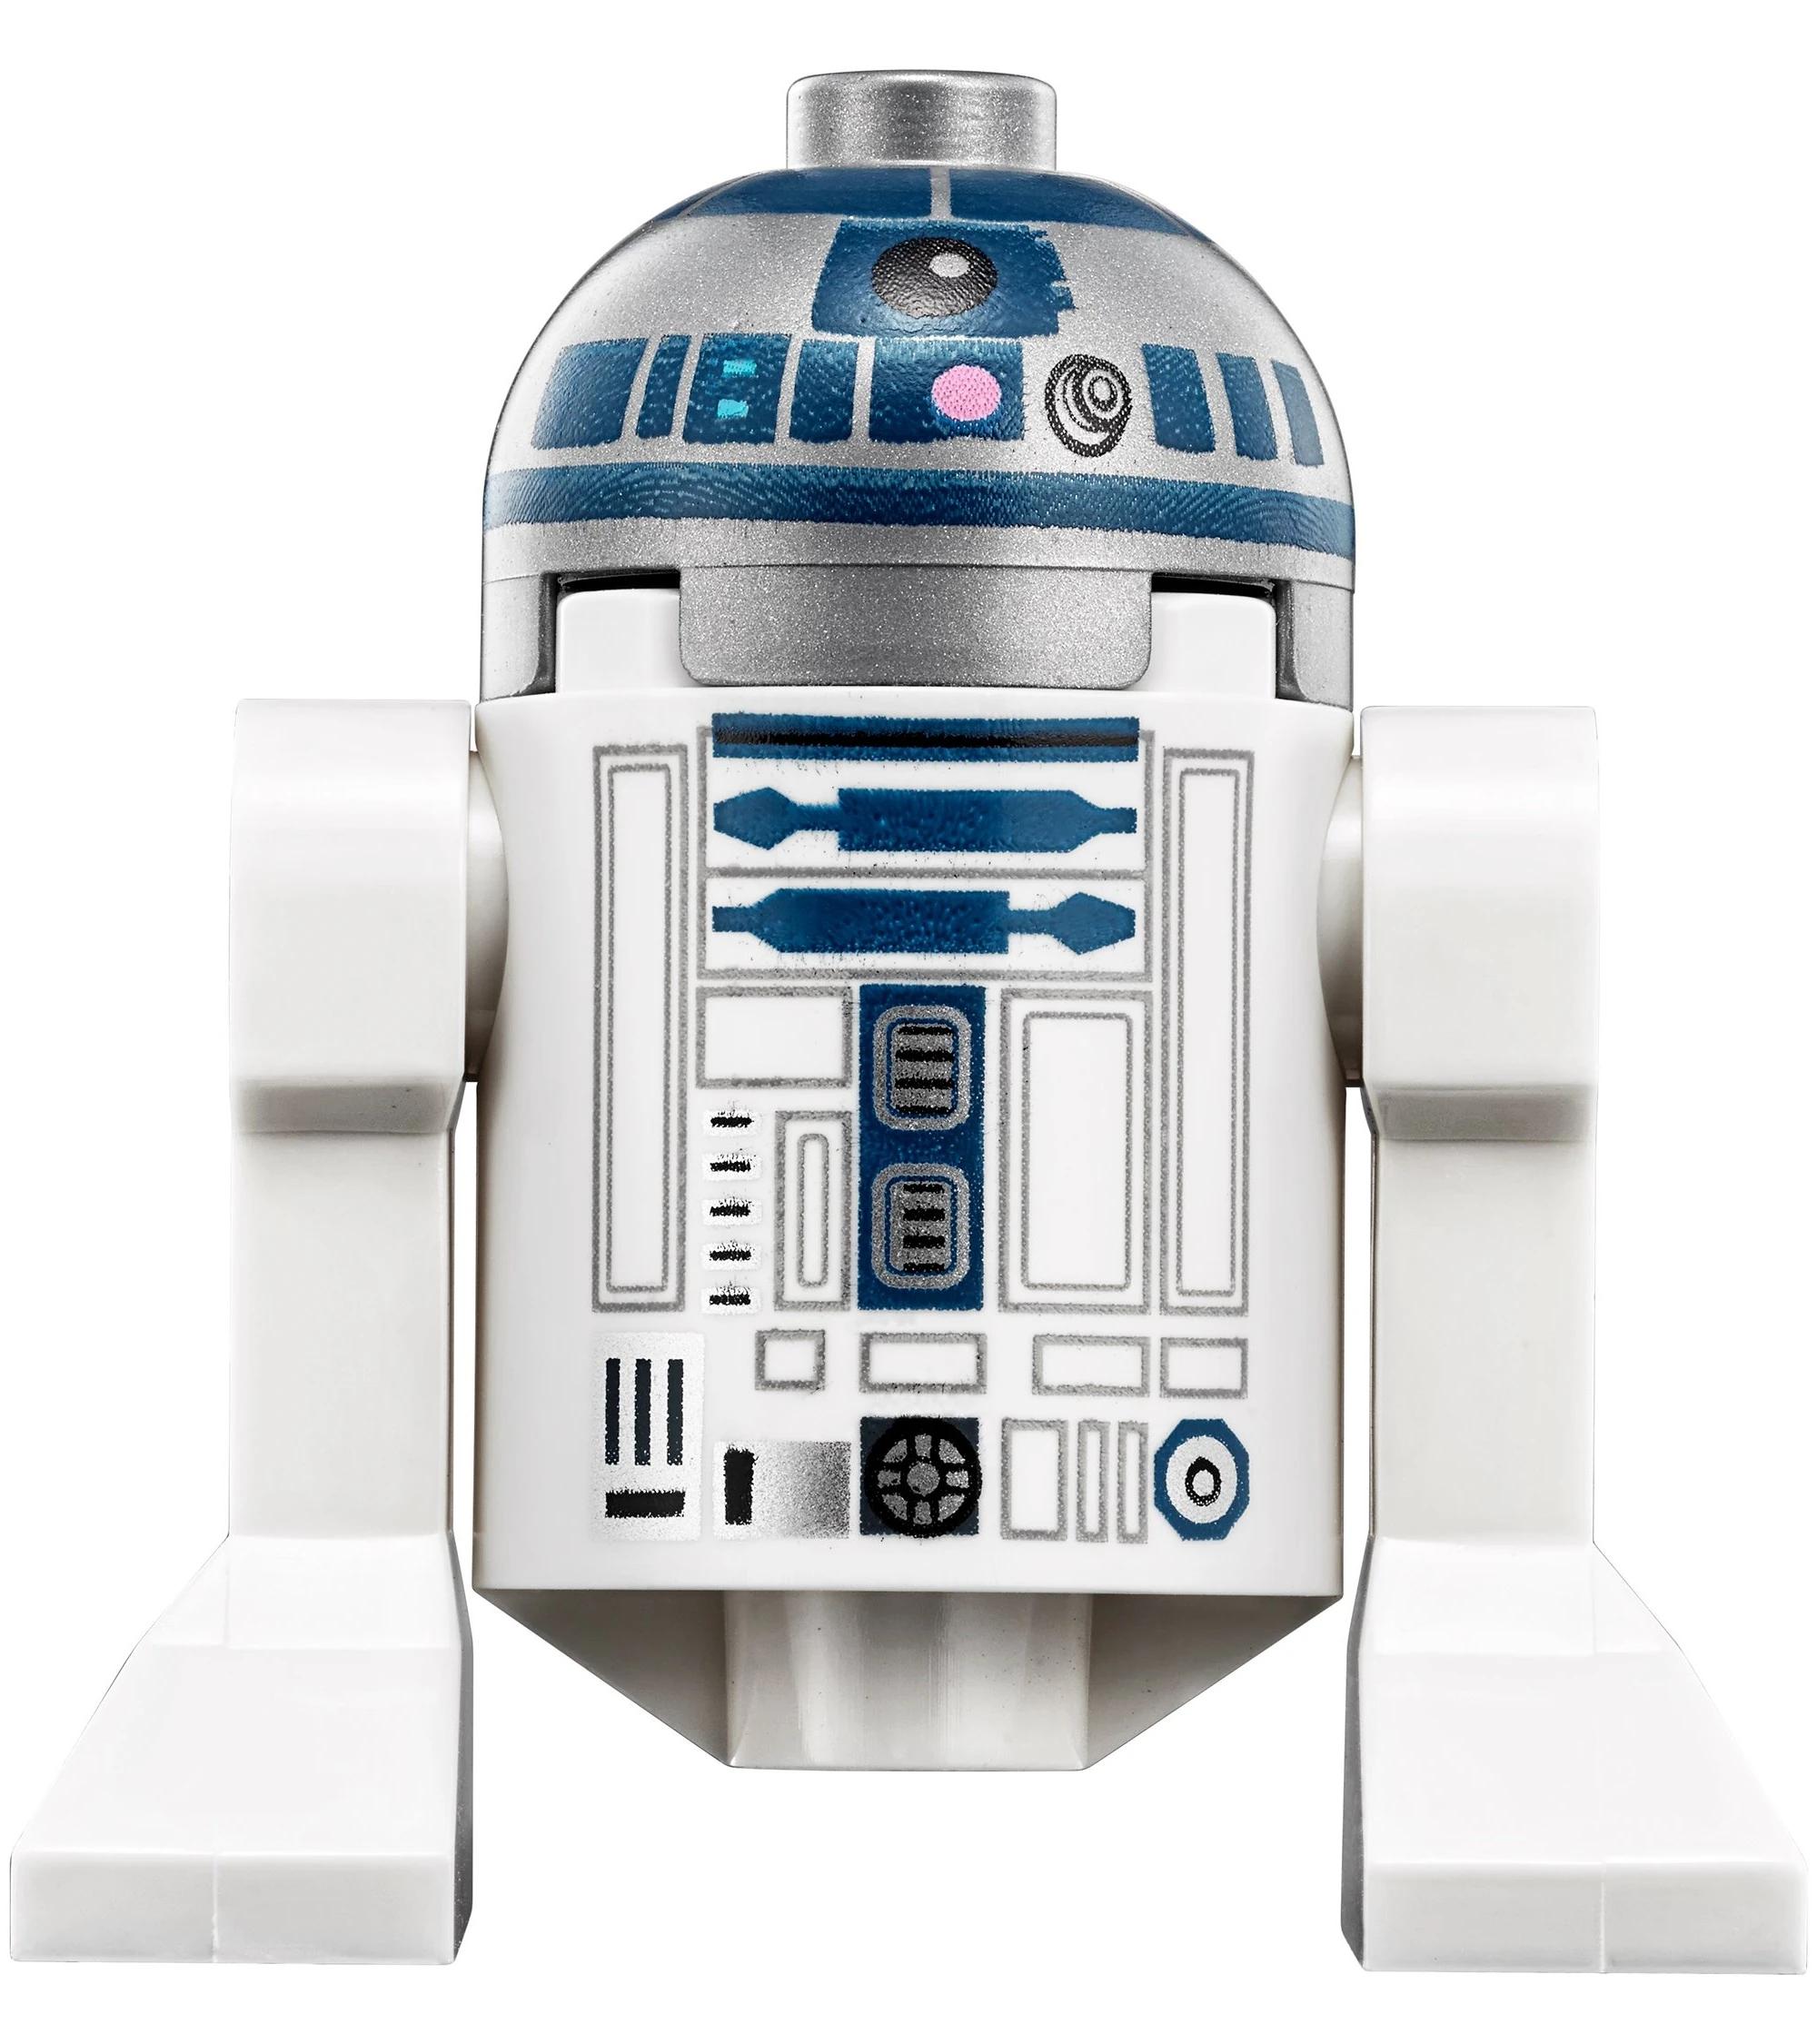 R2 d2 brickipedia the lego wiki - Lego starwars r2d2 ...